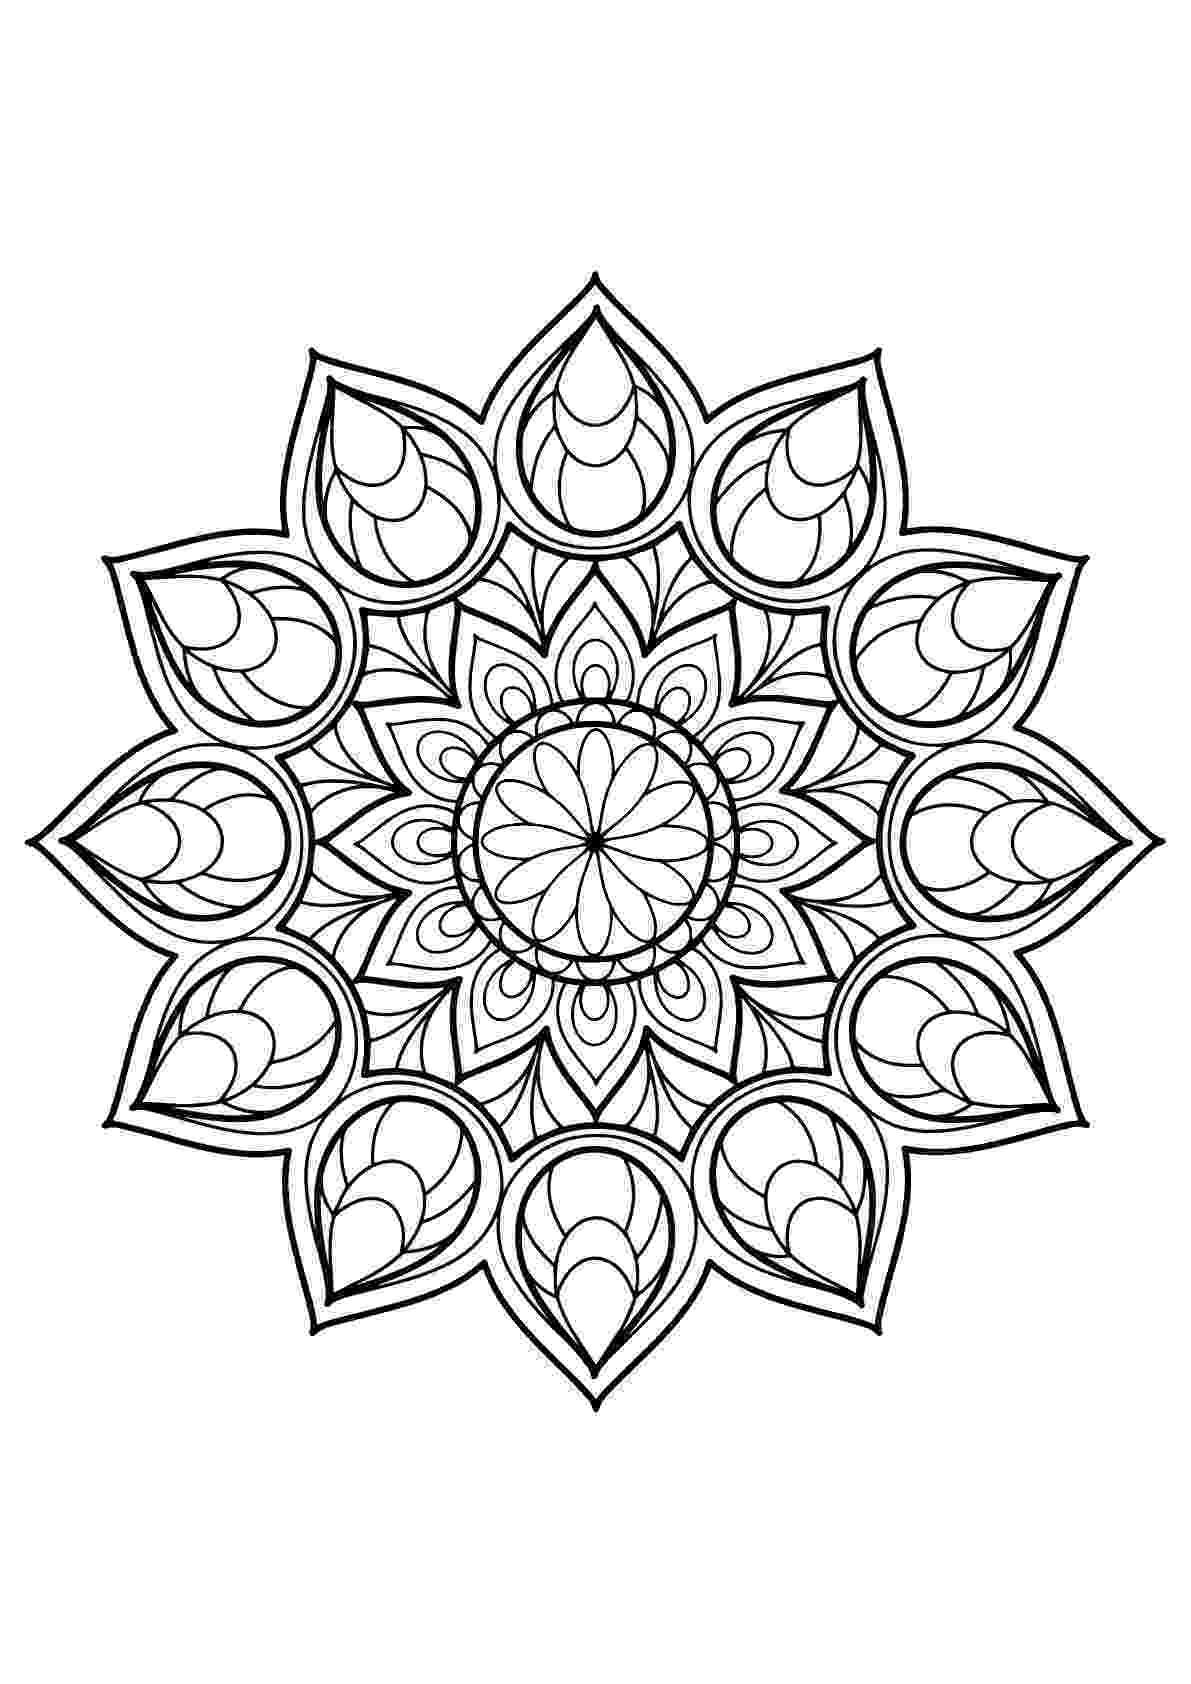 mandala color flower mandala coloring pages best coloring pages for kids mandala color 1 1